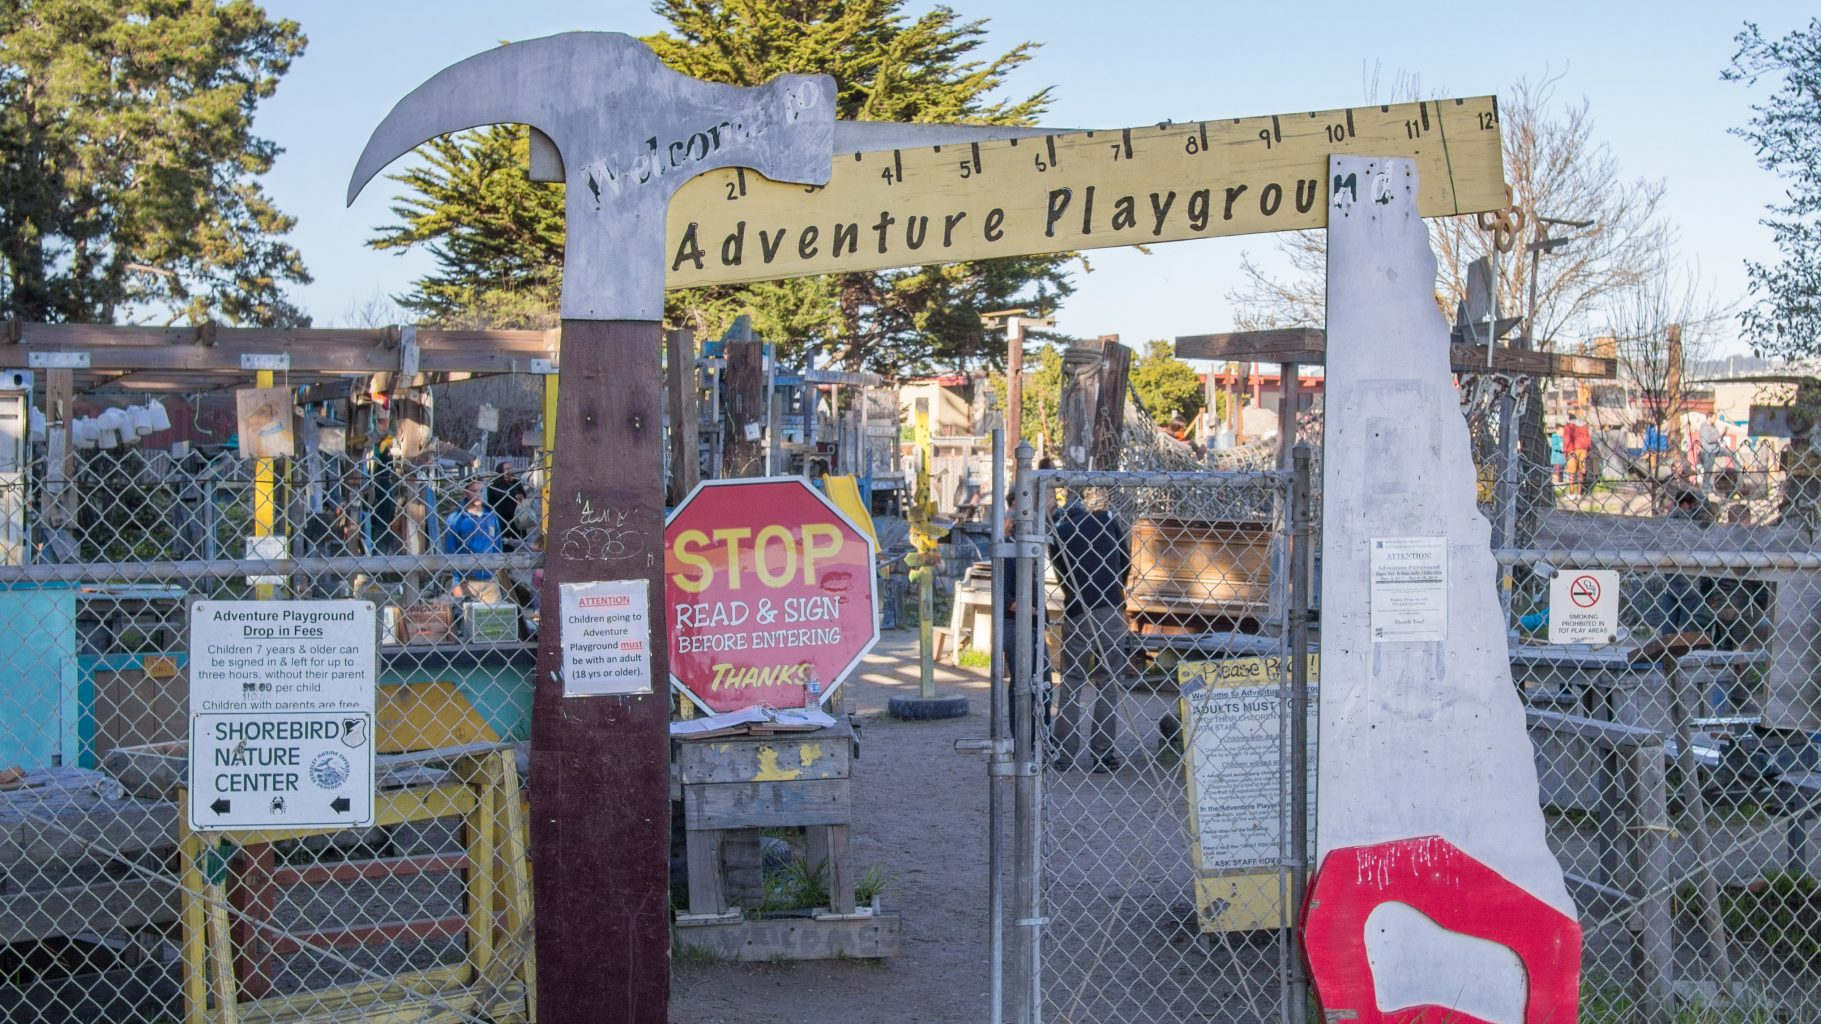 Image: entrance to the Berkeley, California Adventure Playground!